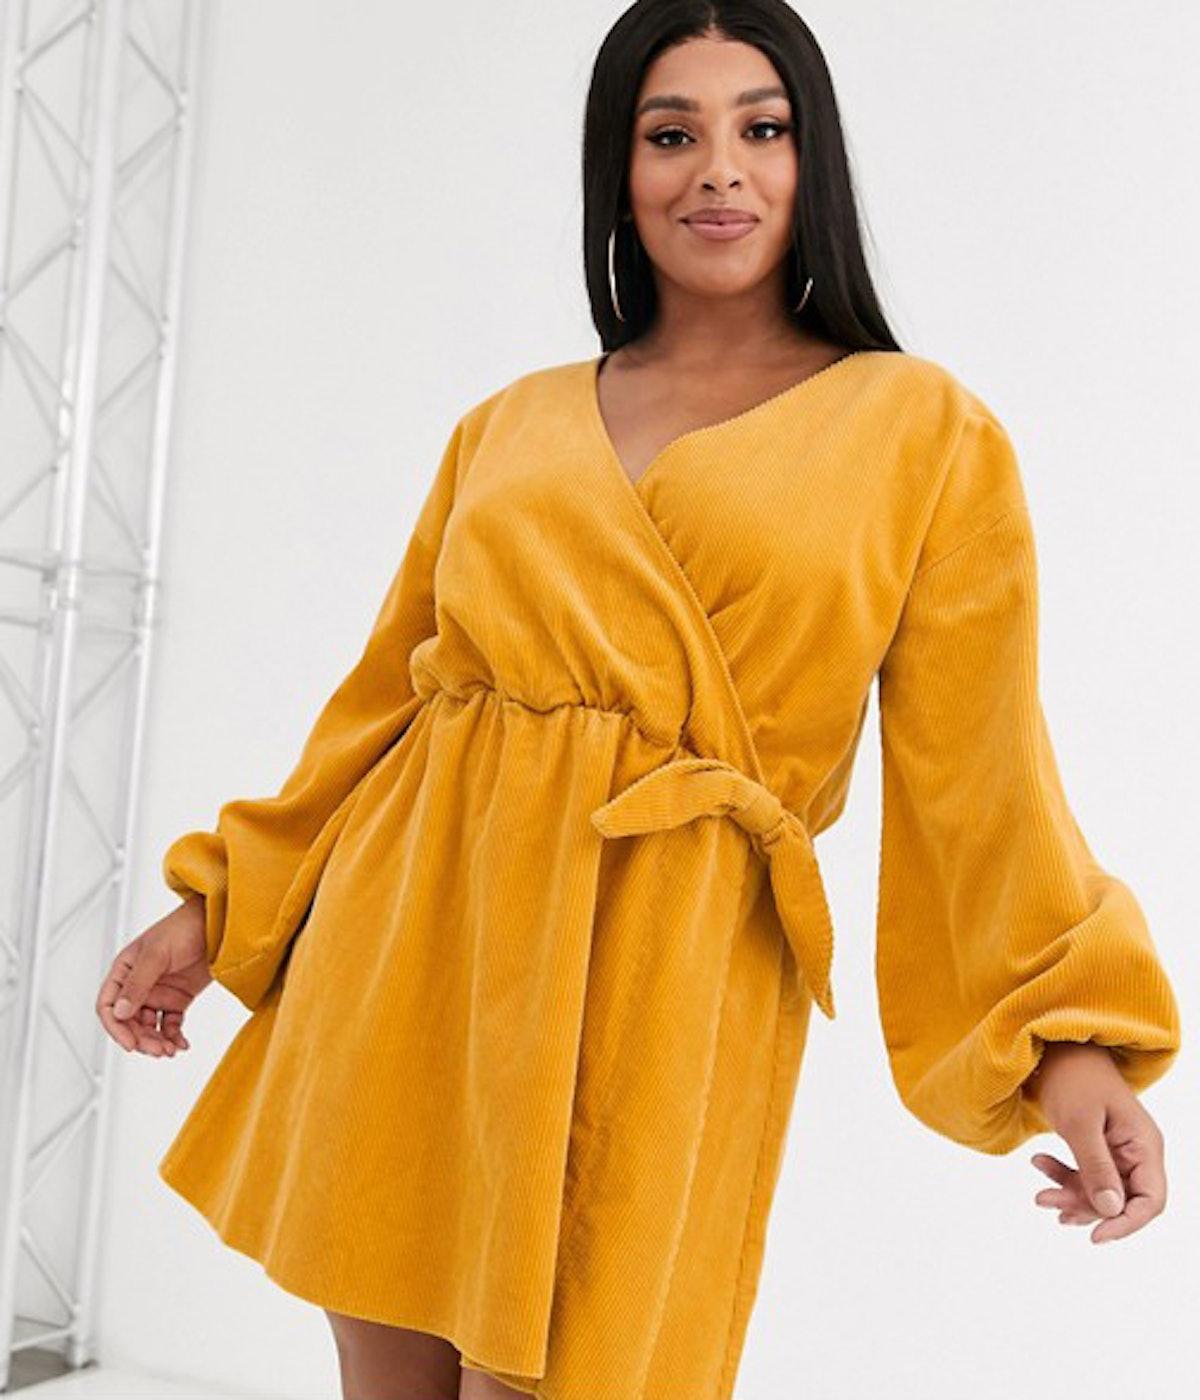 ASOS DESIGN Curve Cord Wrap Smock Mini Dress in Marigold